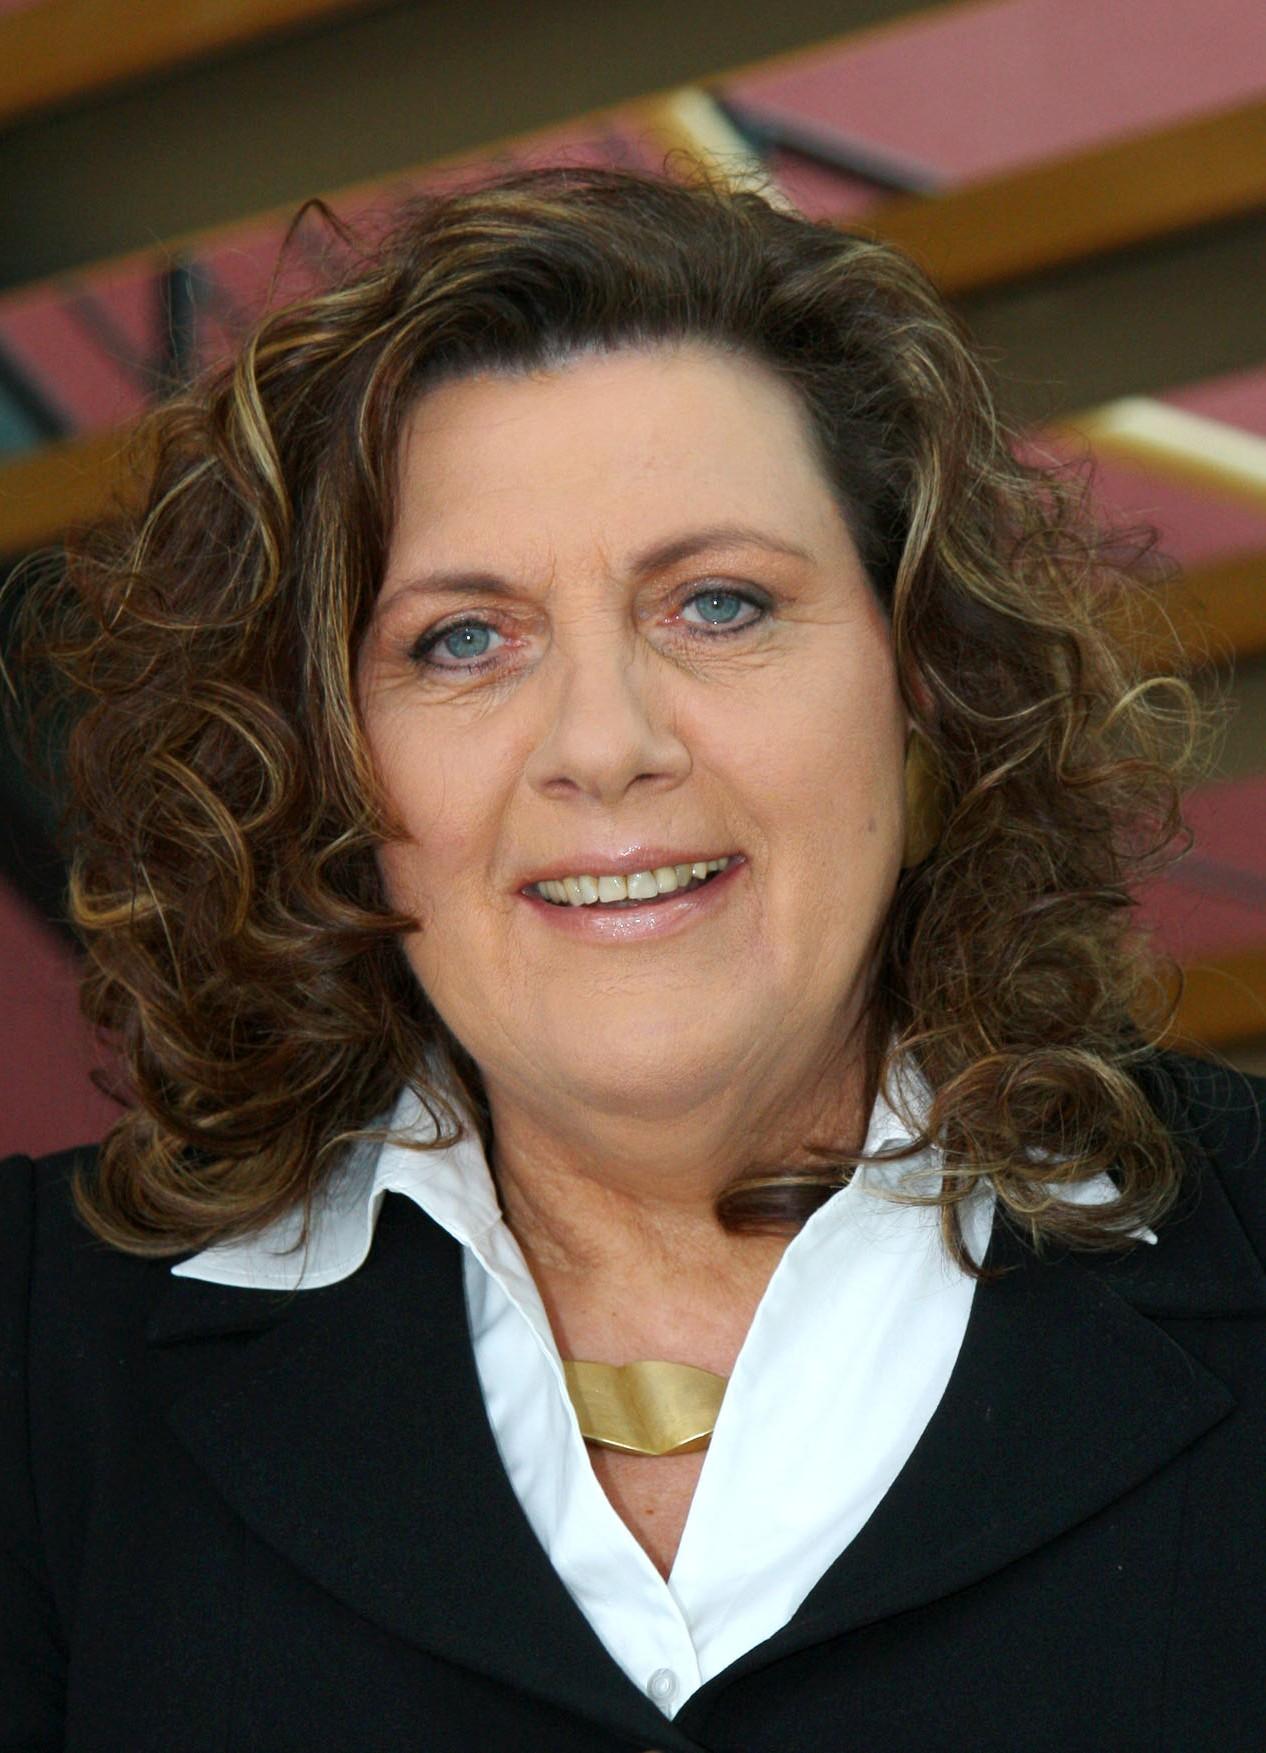 Doris Stempfle